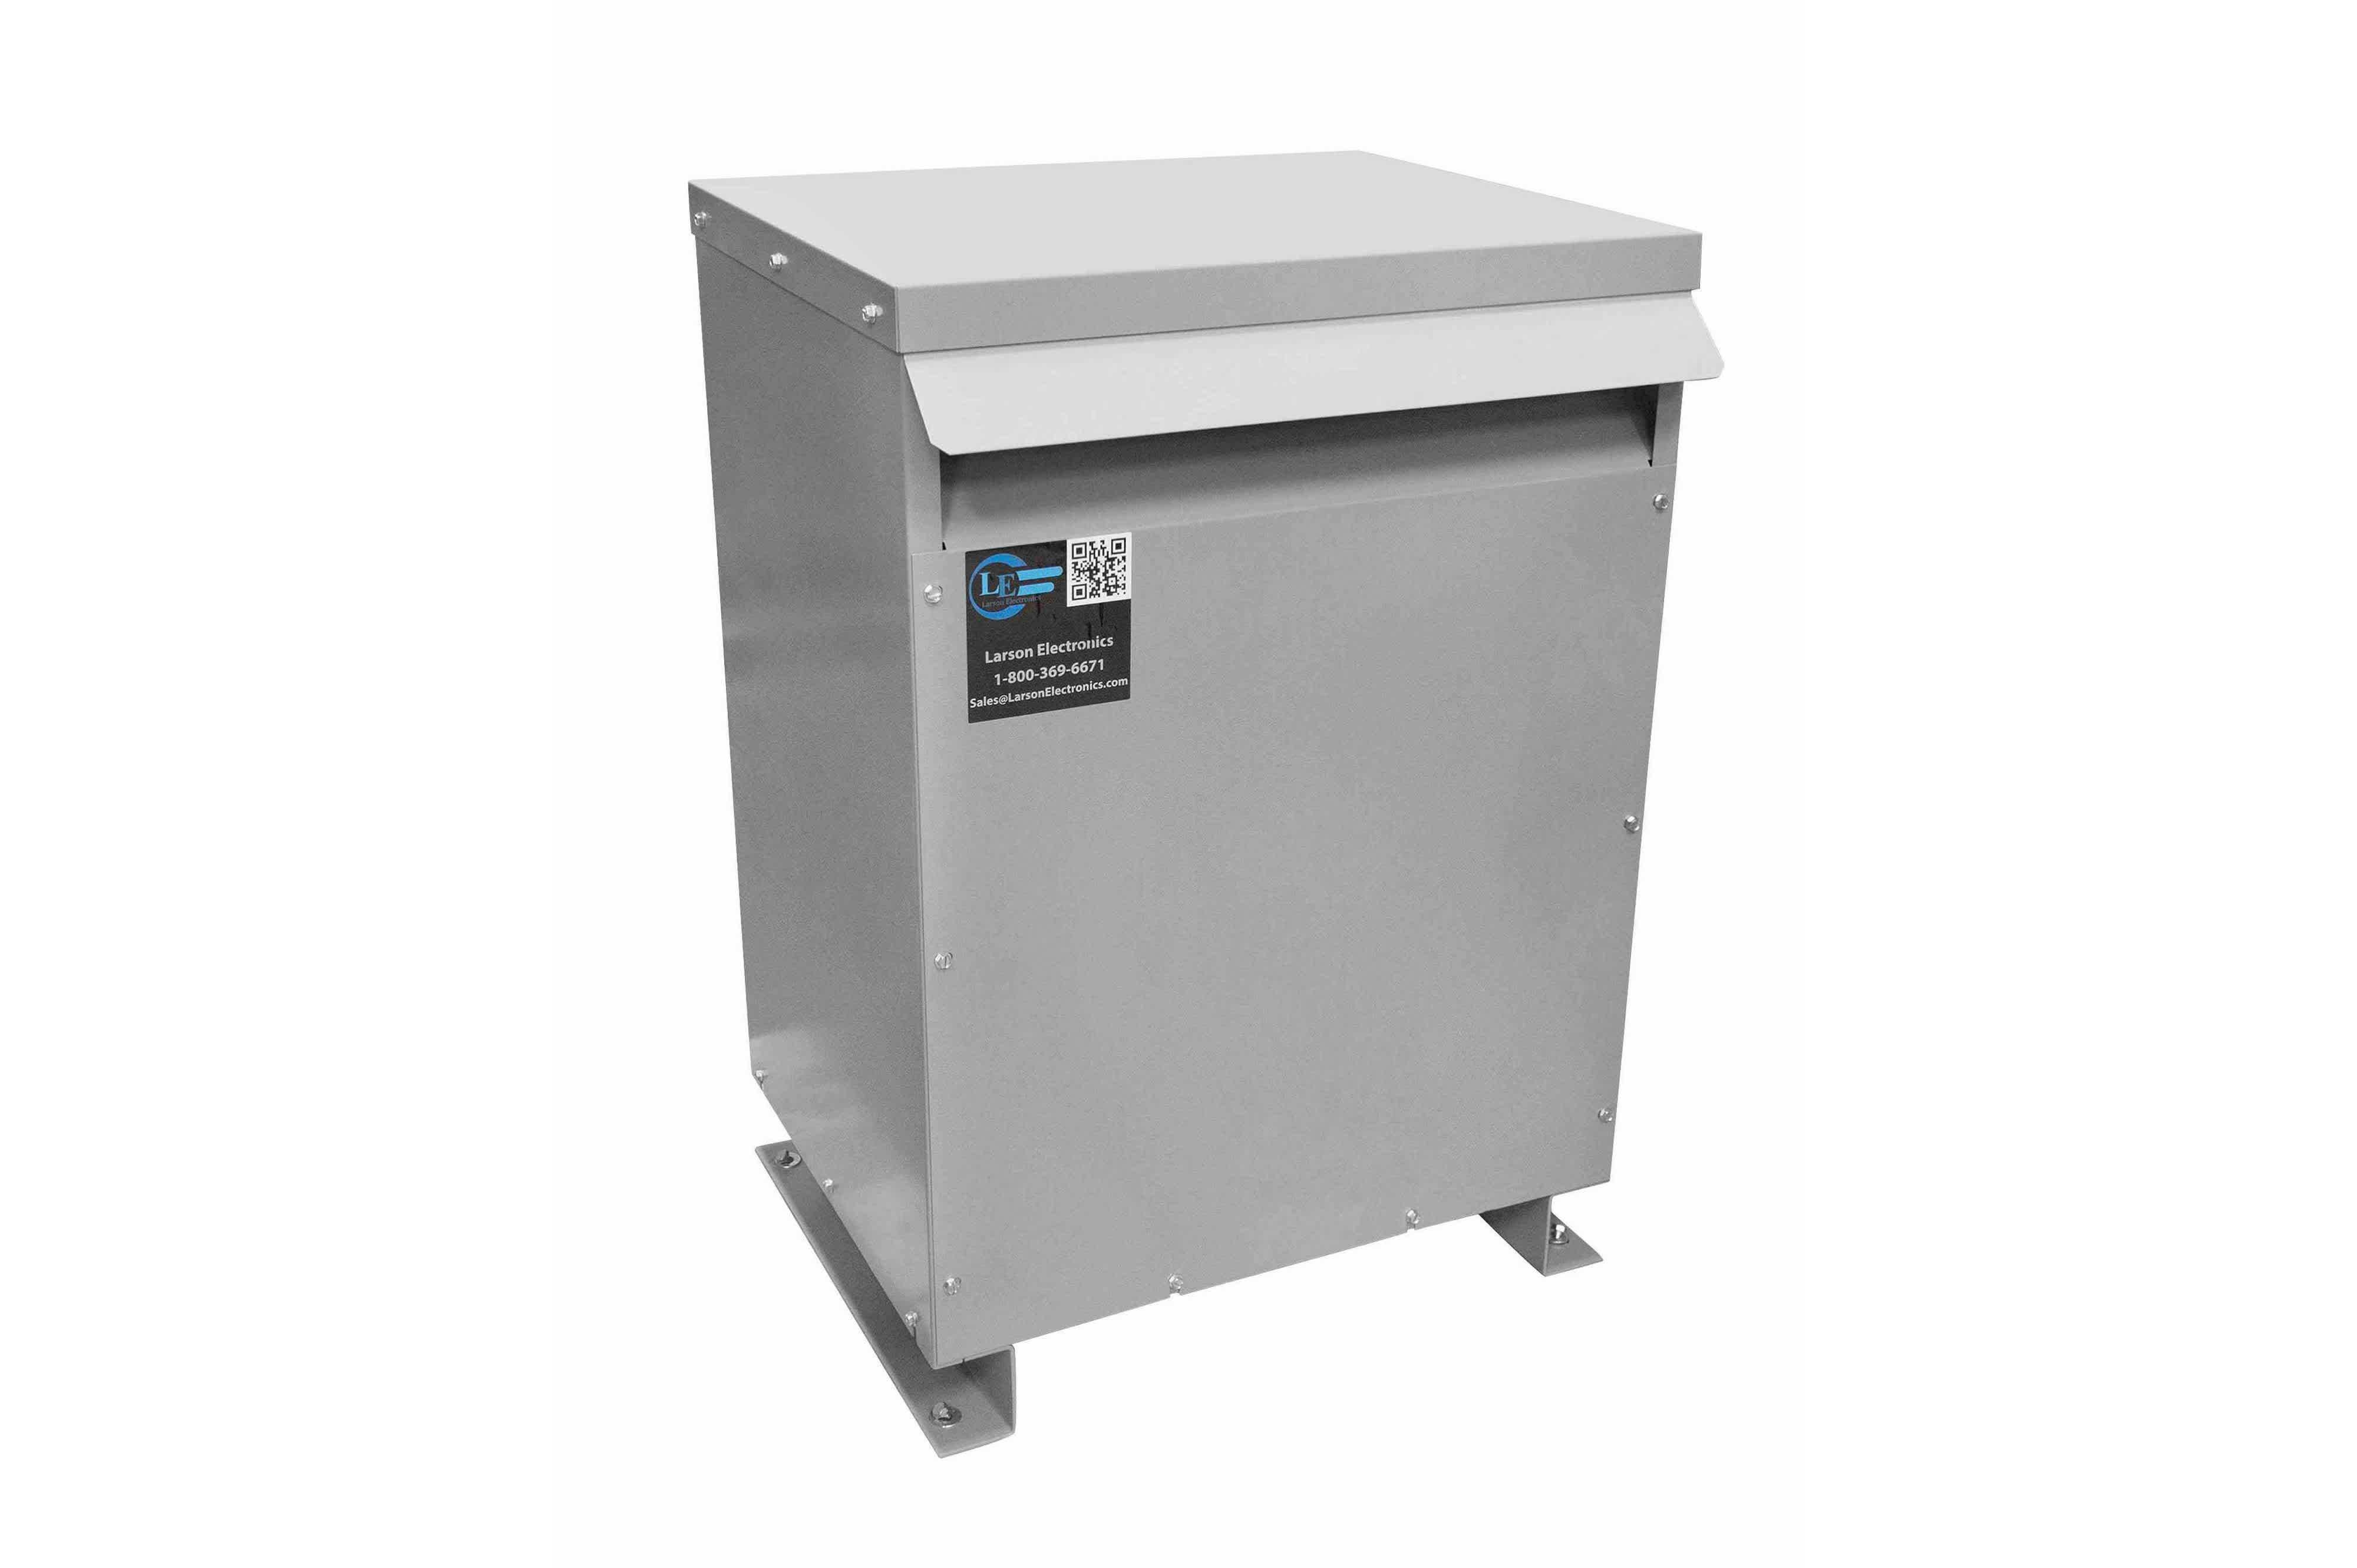 22.5 kVA 3PH Isolation Transformer, 575V Wye Primary, 415Y/240 Wye-N Secondary, N3R, Ventilated, 60 Hz